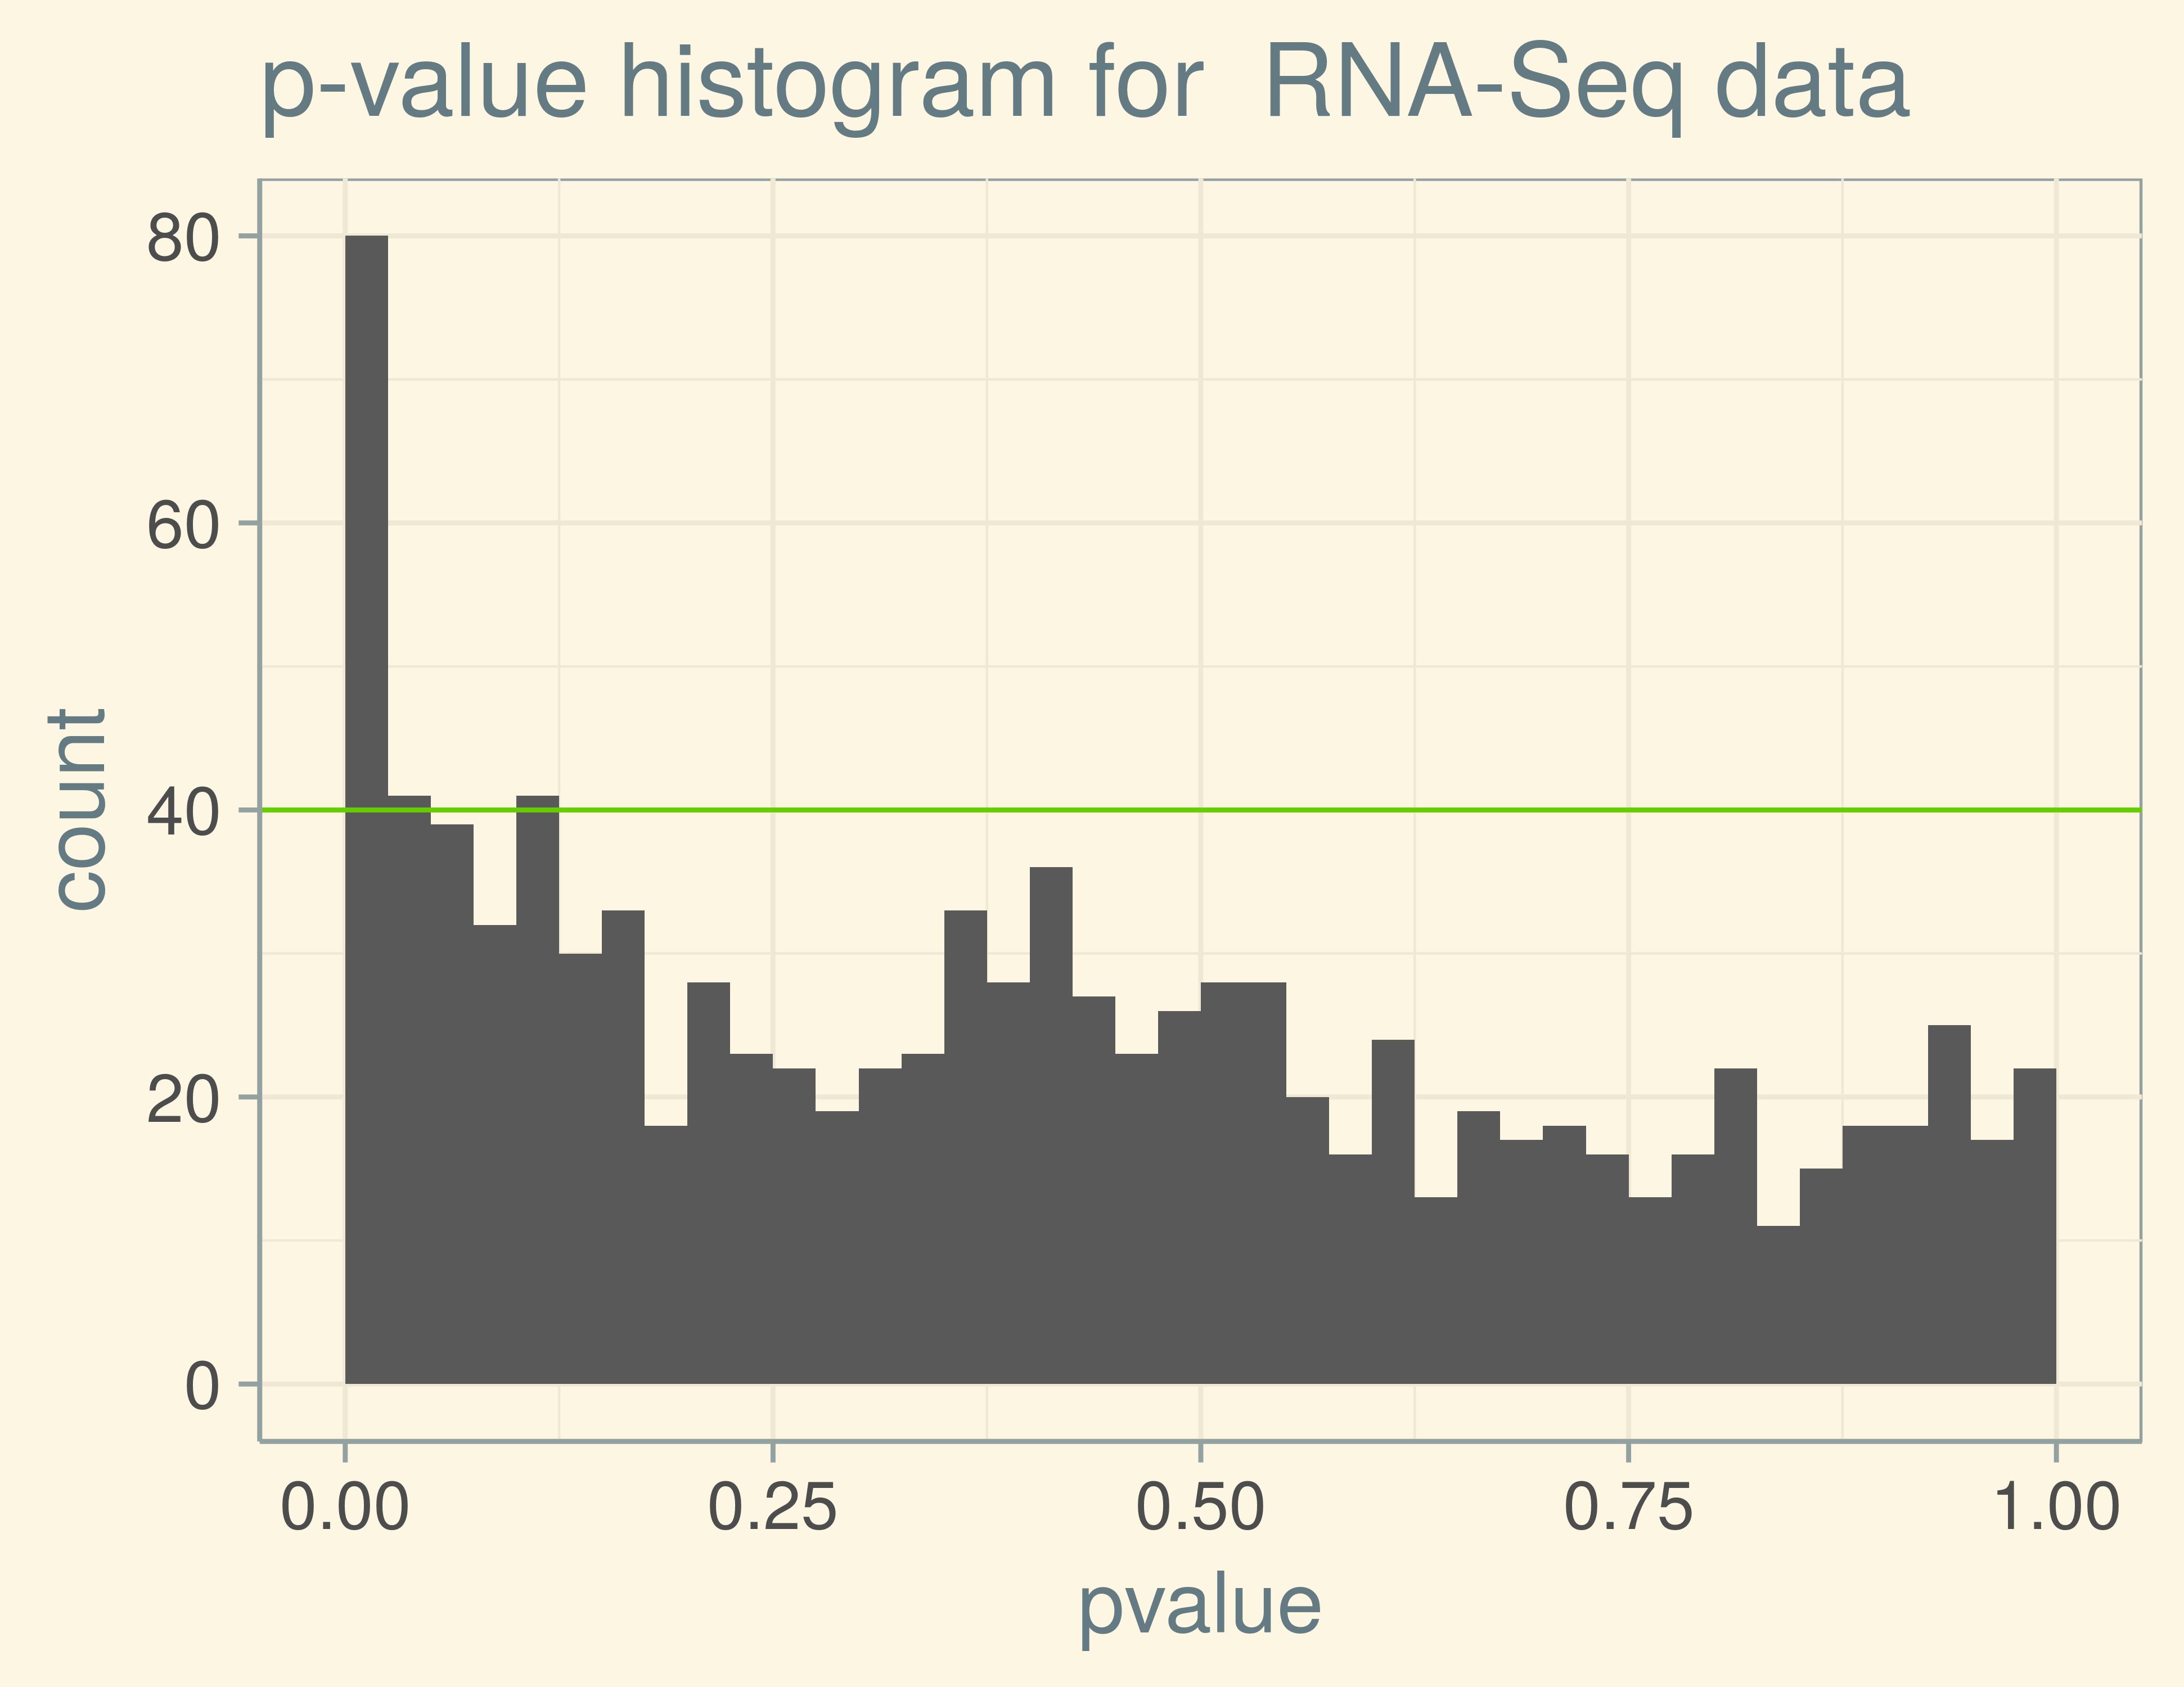 Slides_stat_methods_bioinf/slides_factor_ana_testing_ml_files/figure-slidy/rnaSeqPvalHist-1.png